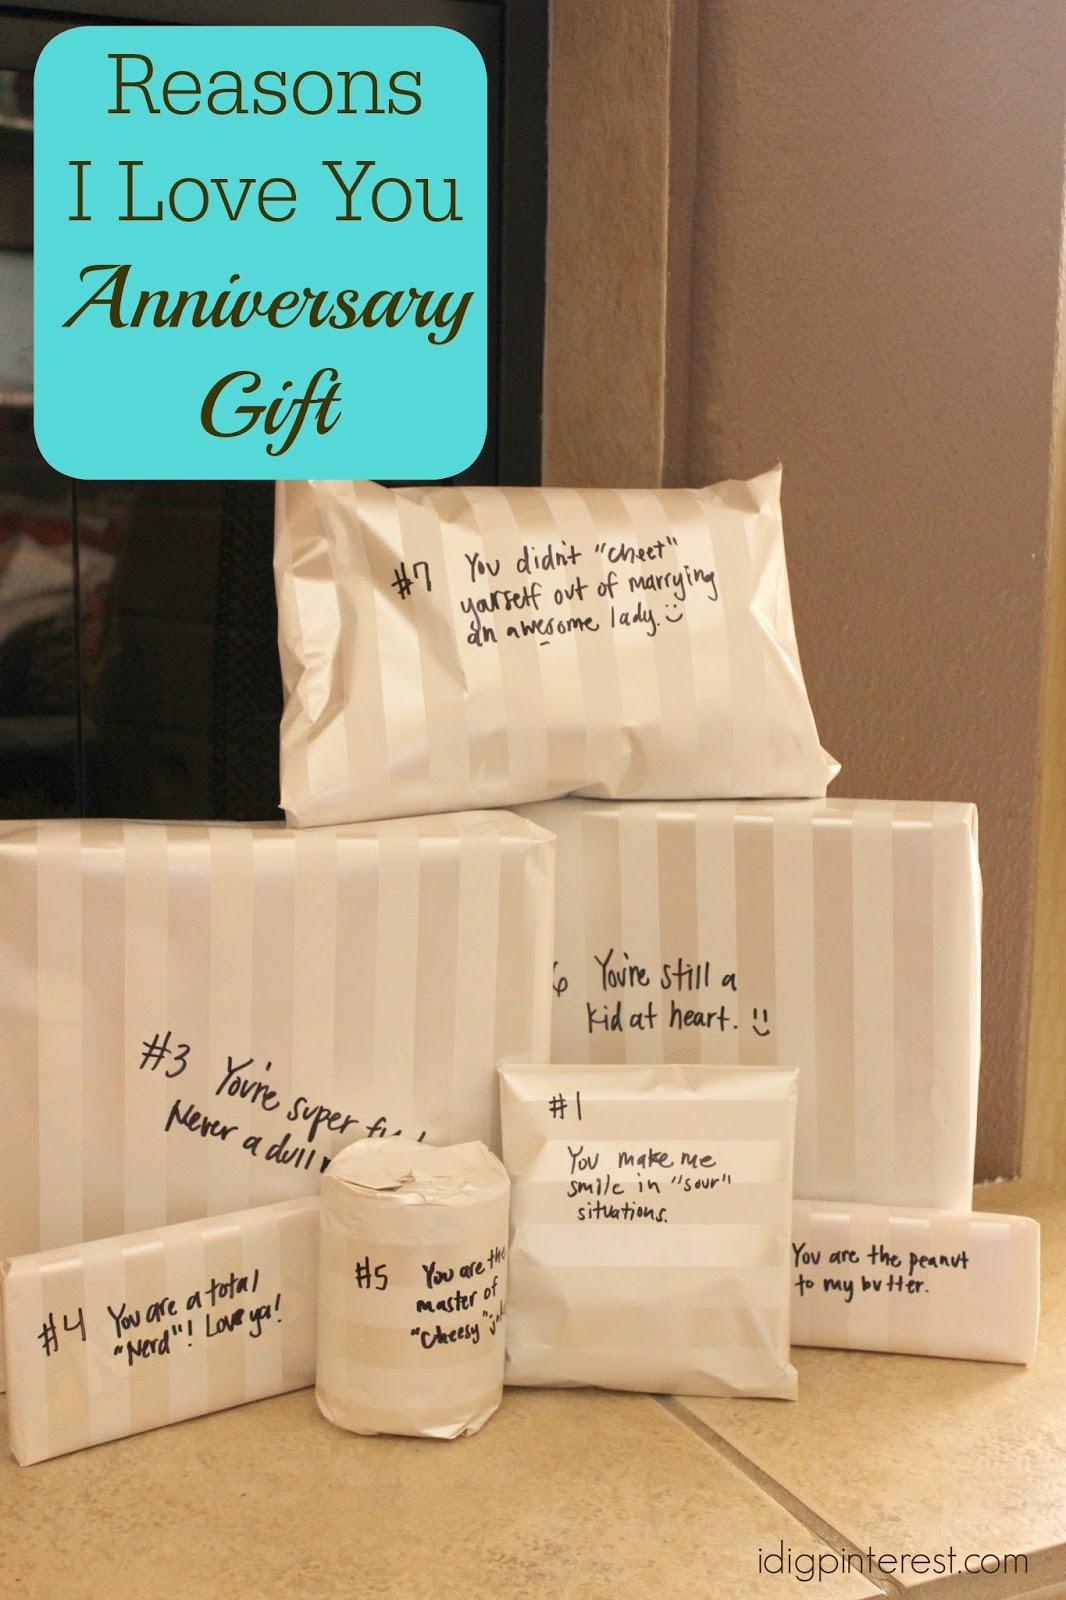 I Dig Pinterest: Reasons I Love You Wedding Anniversary ...